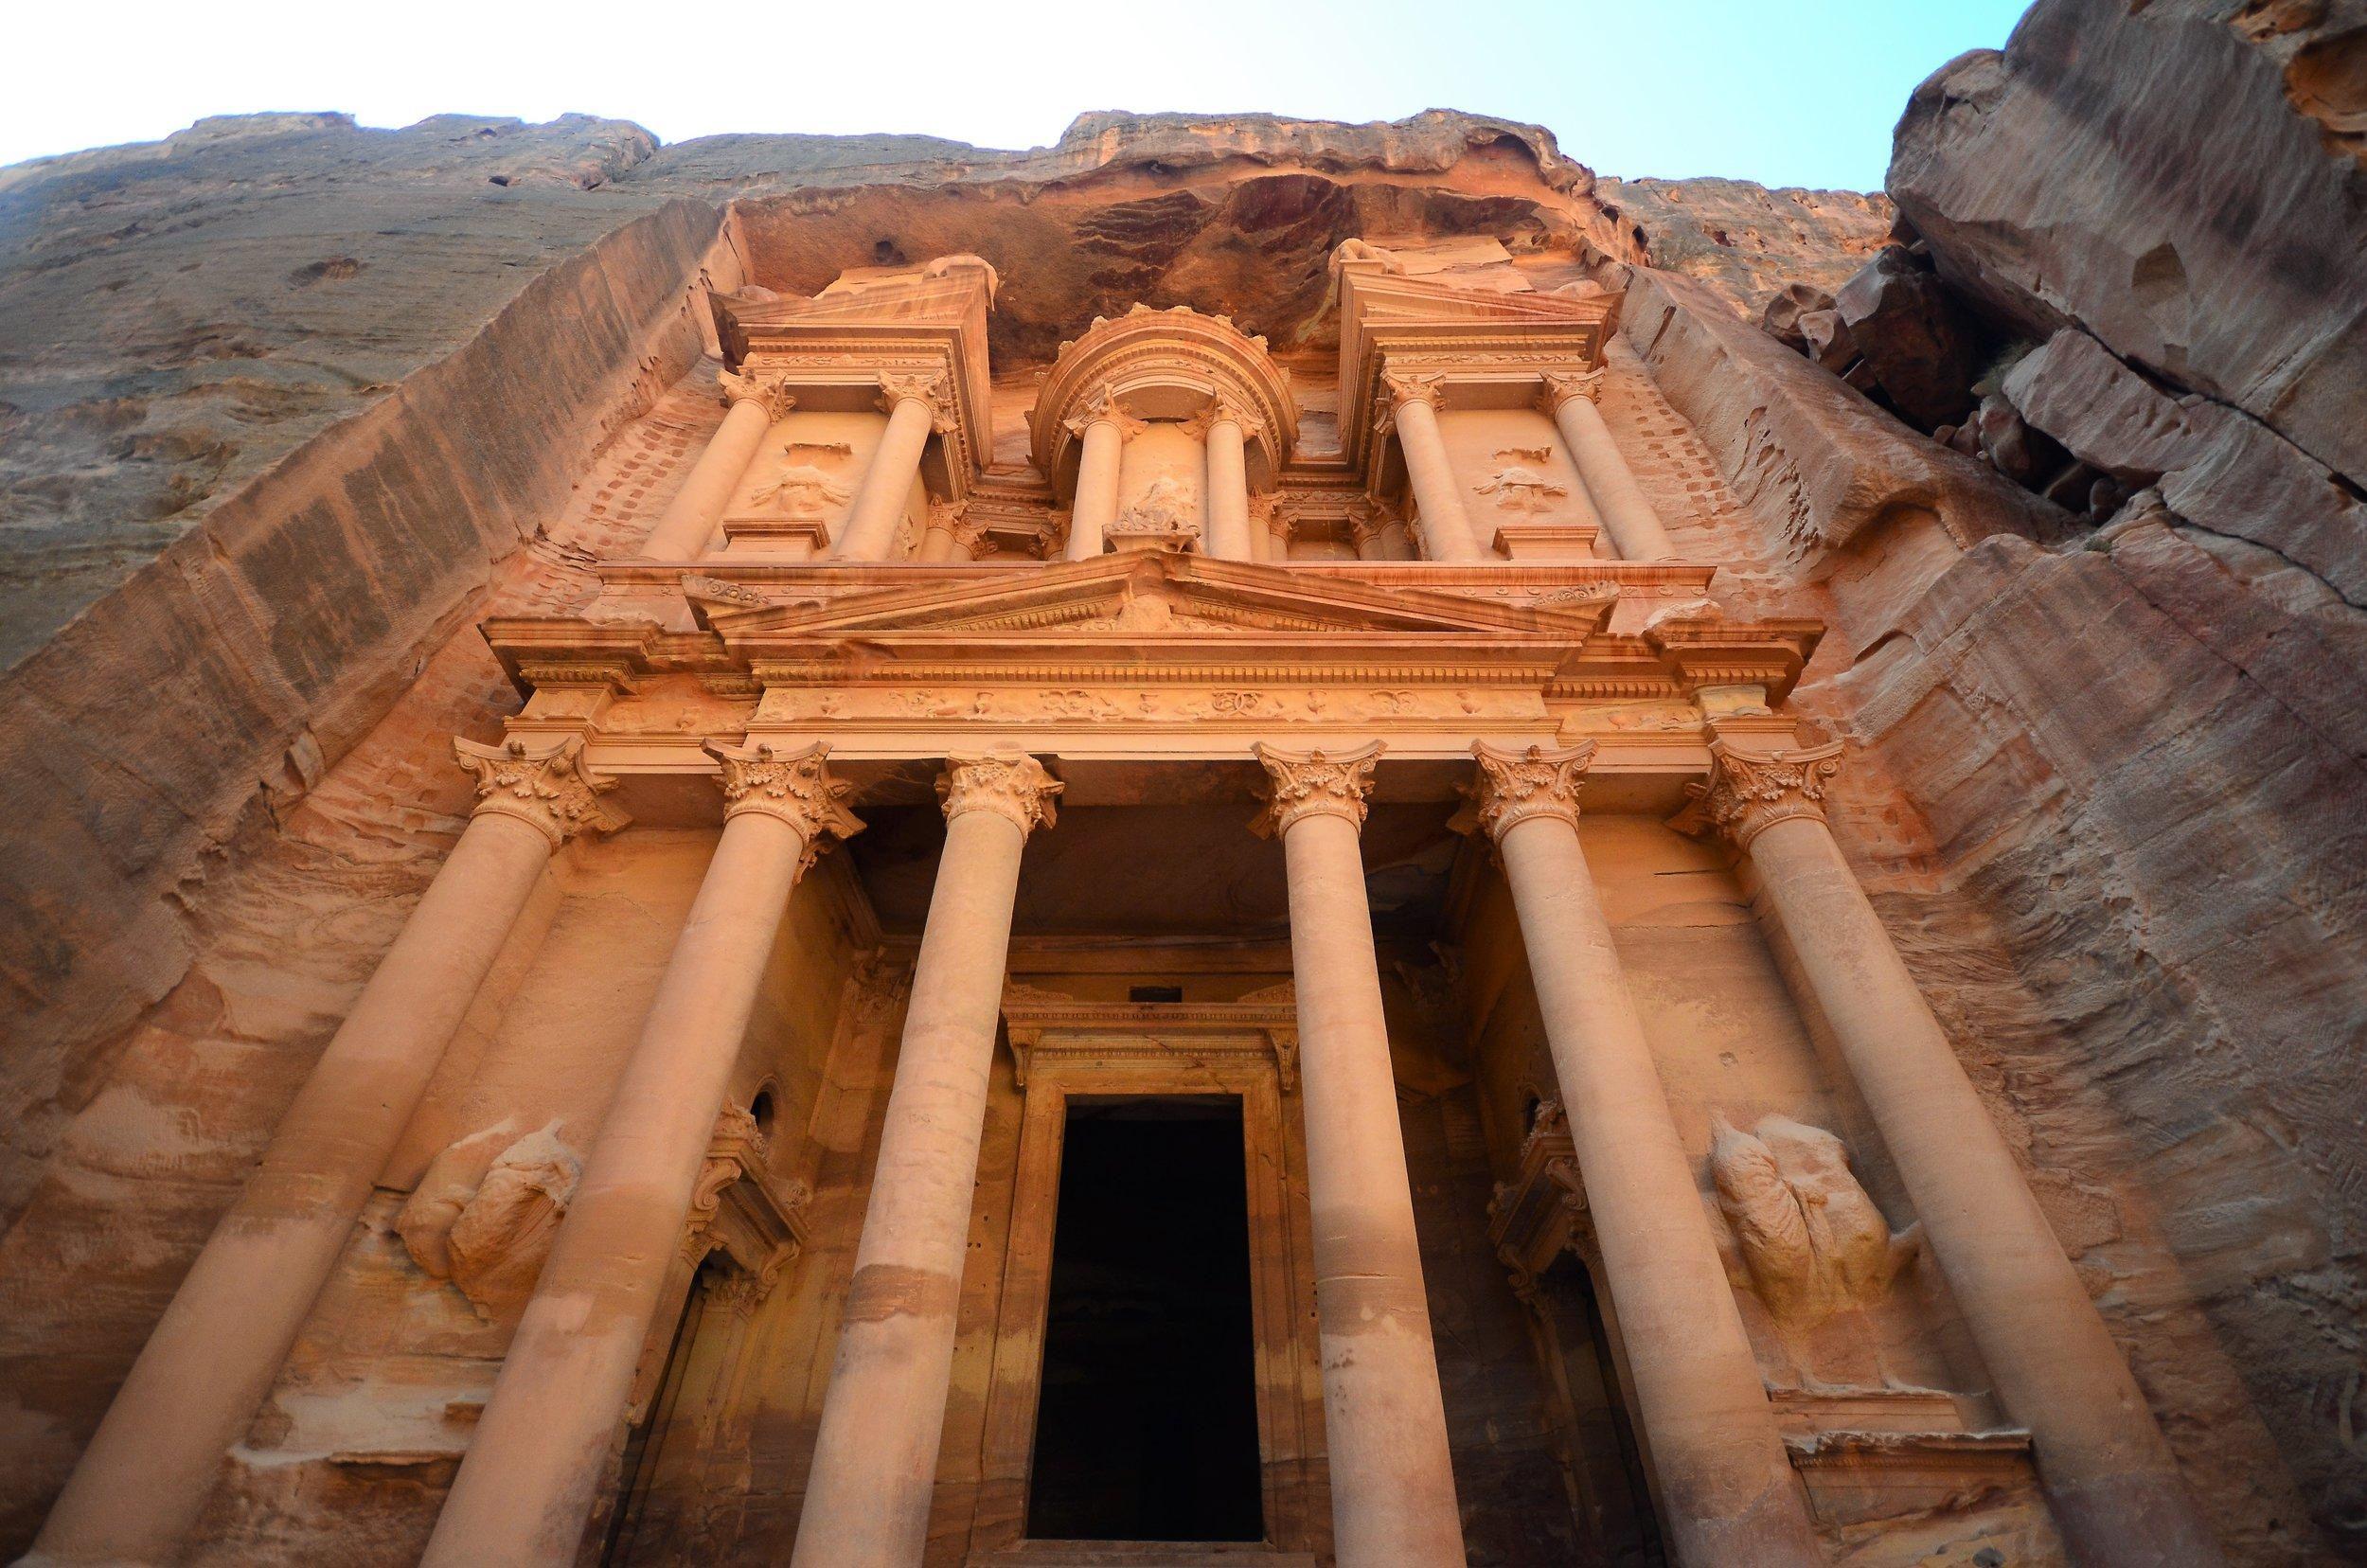 Popular tourist destination Petra in Southern Jordan